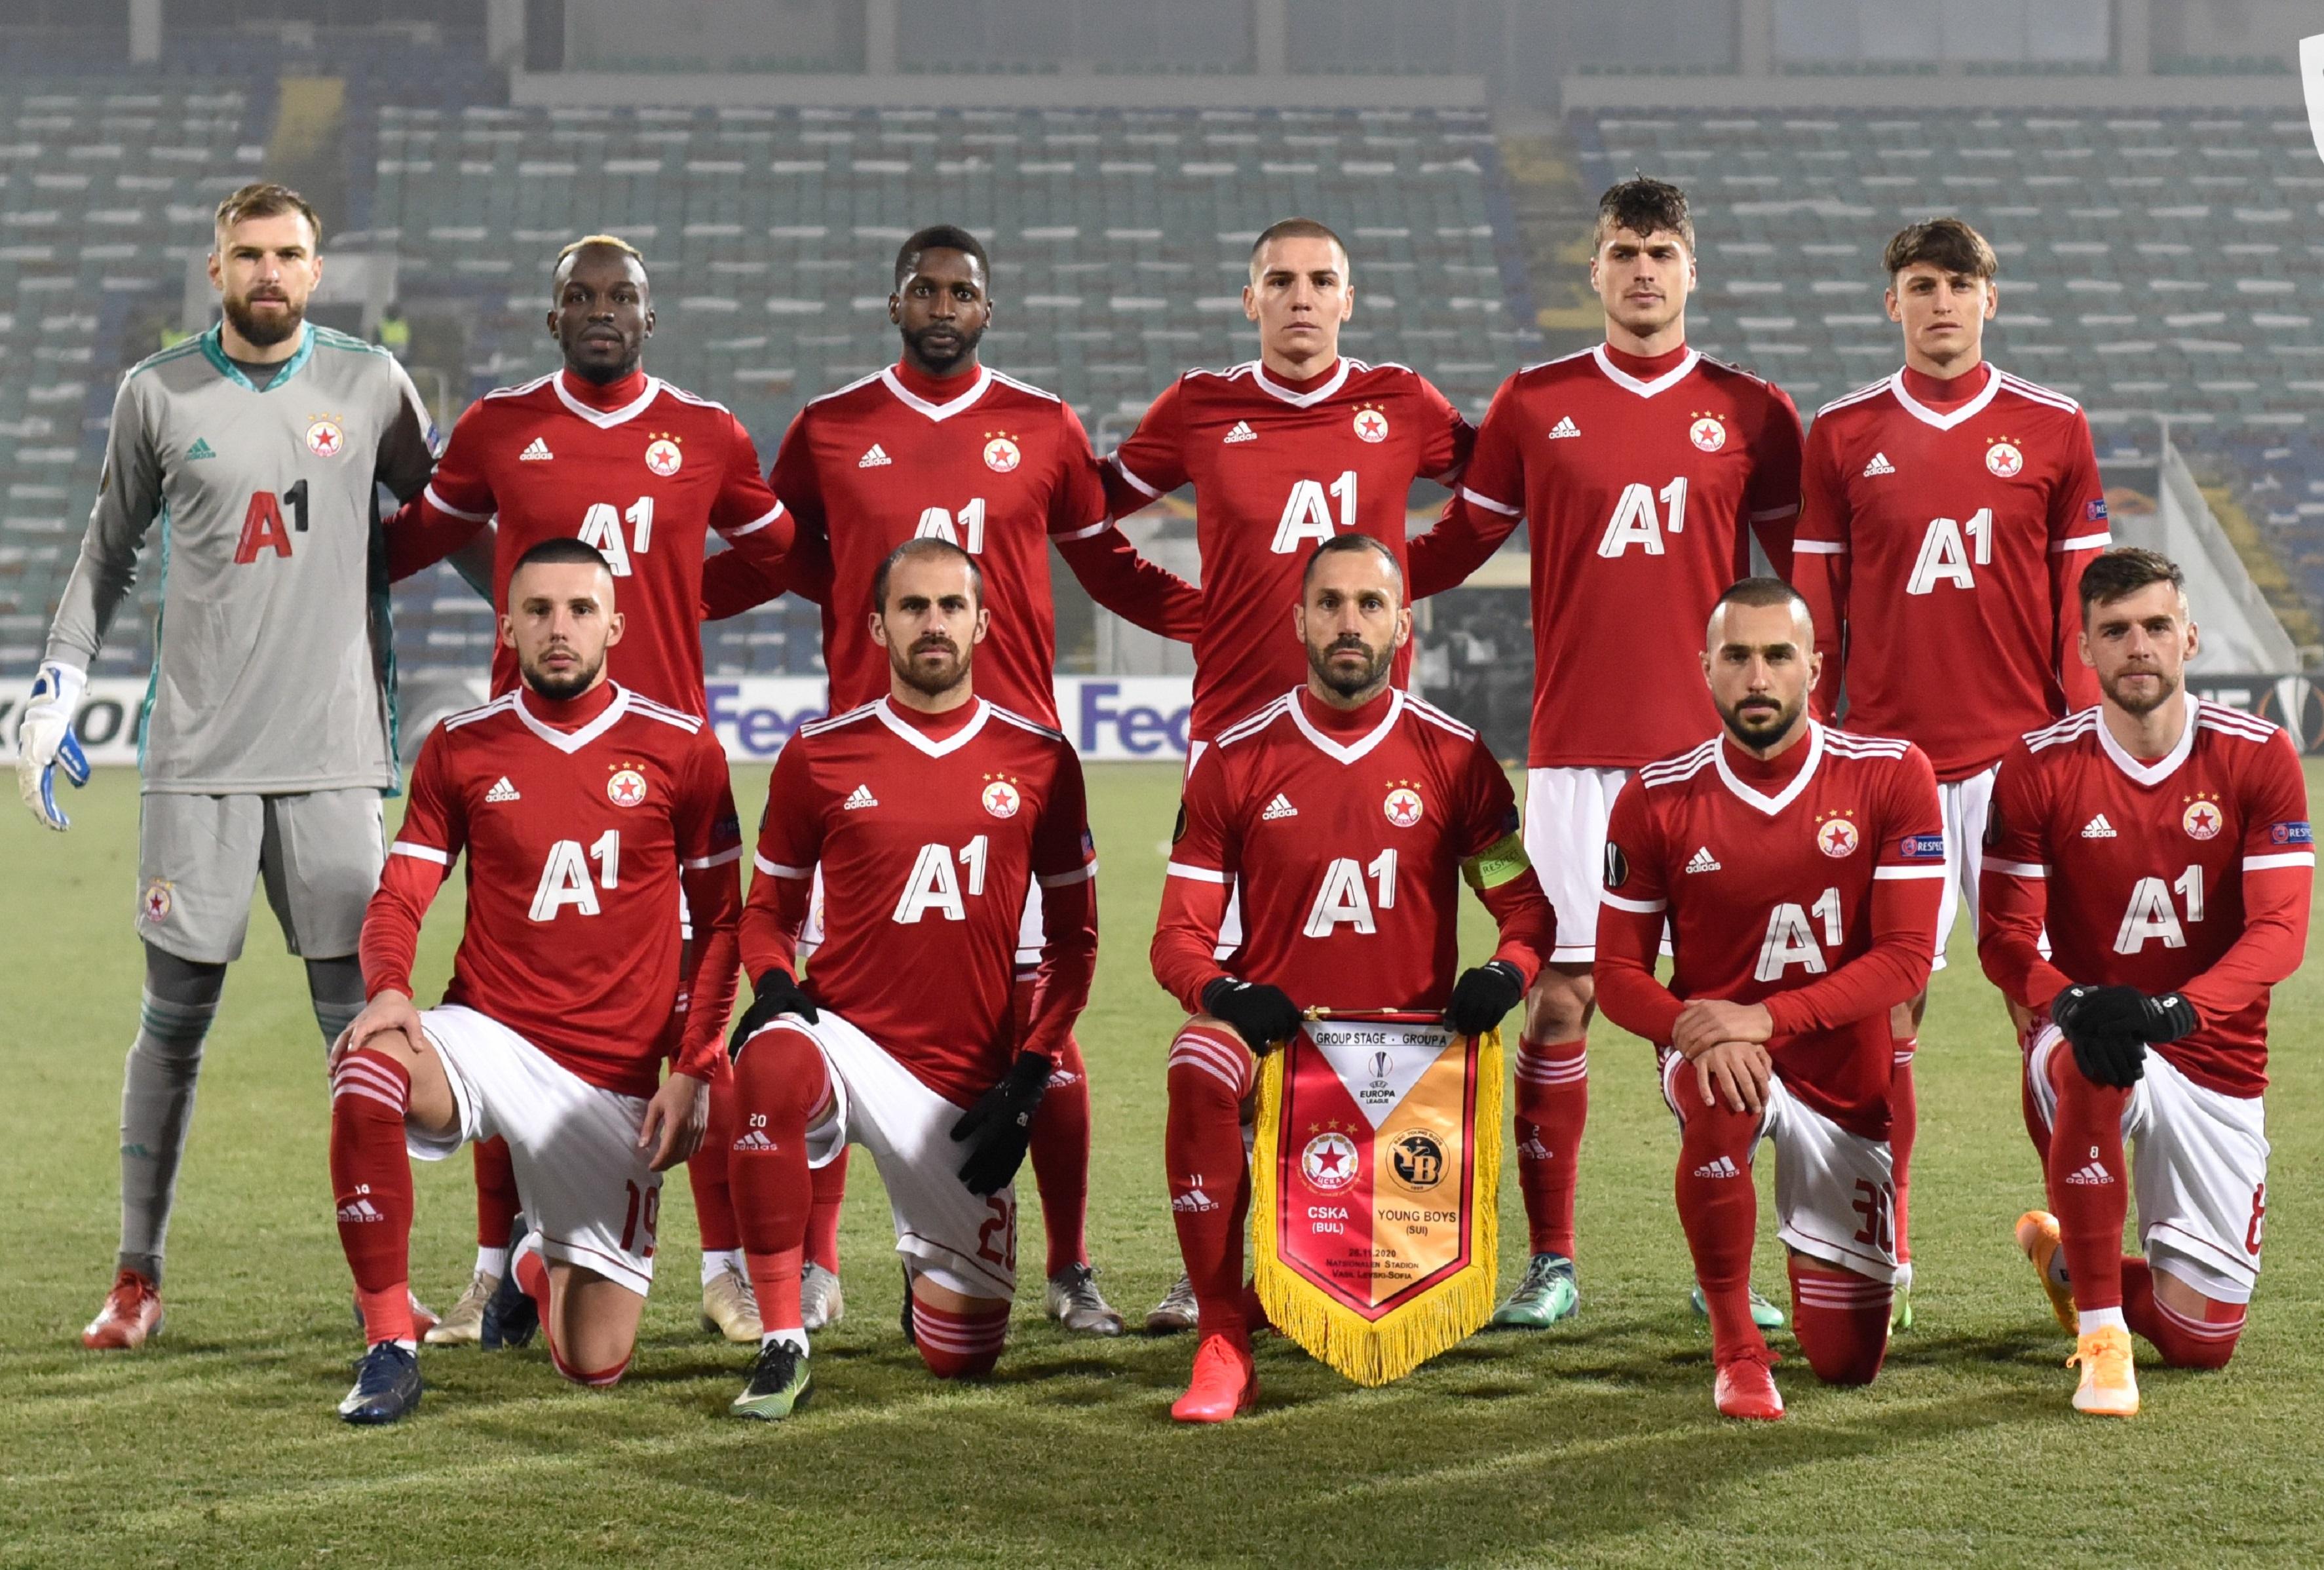 ЦСКА София (Болгария) - Янг Бойз (Швейцария) 0:1